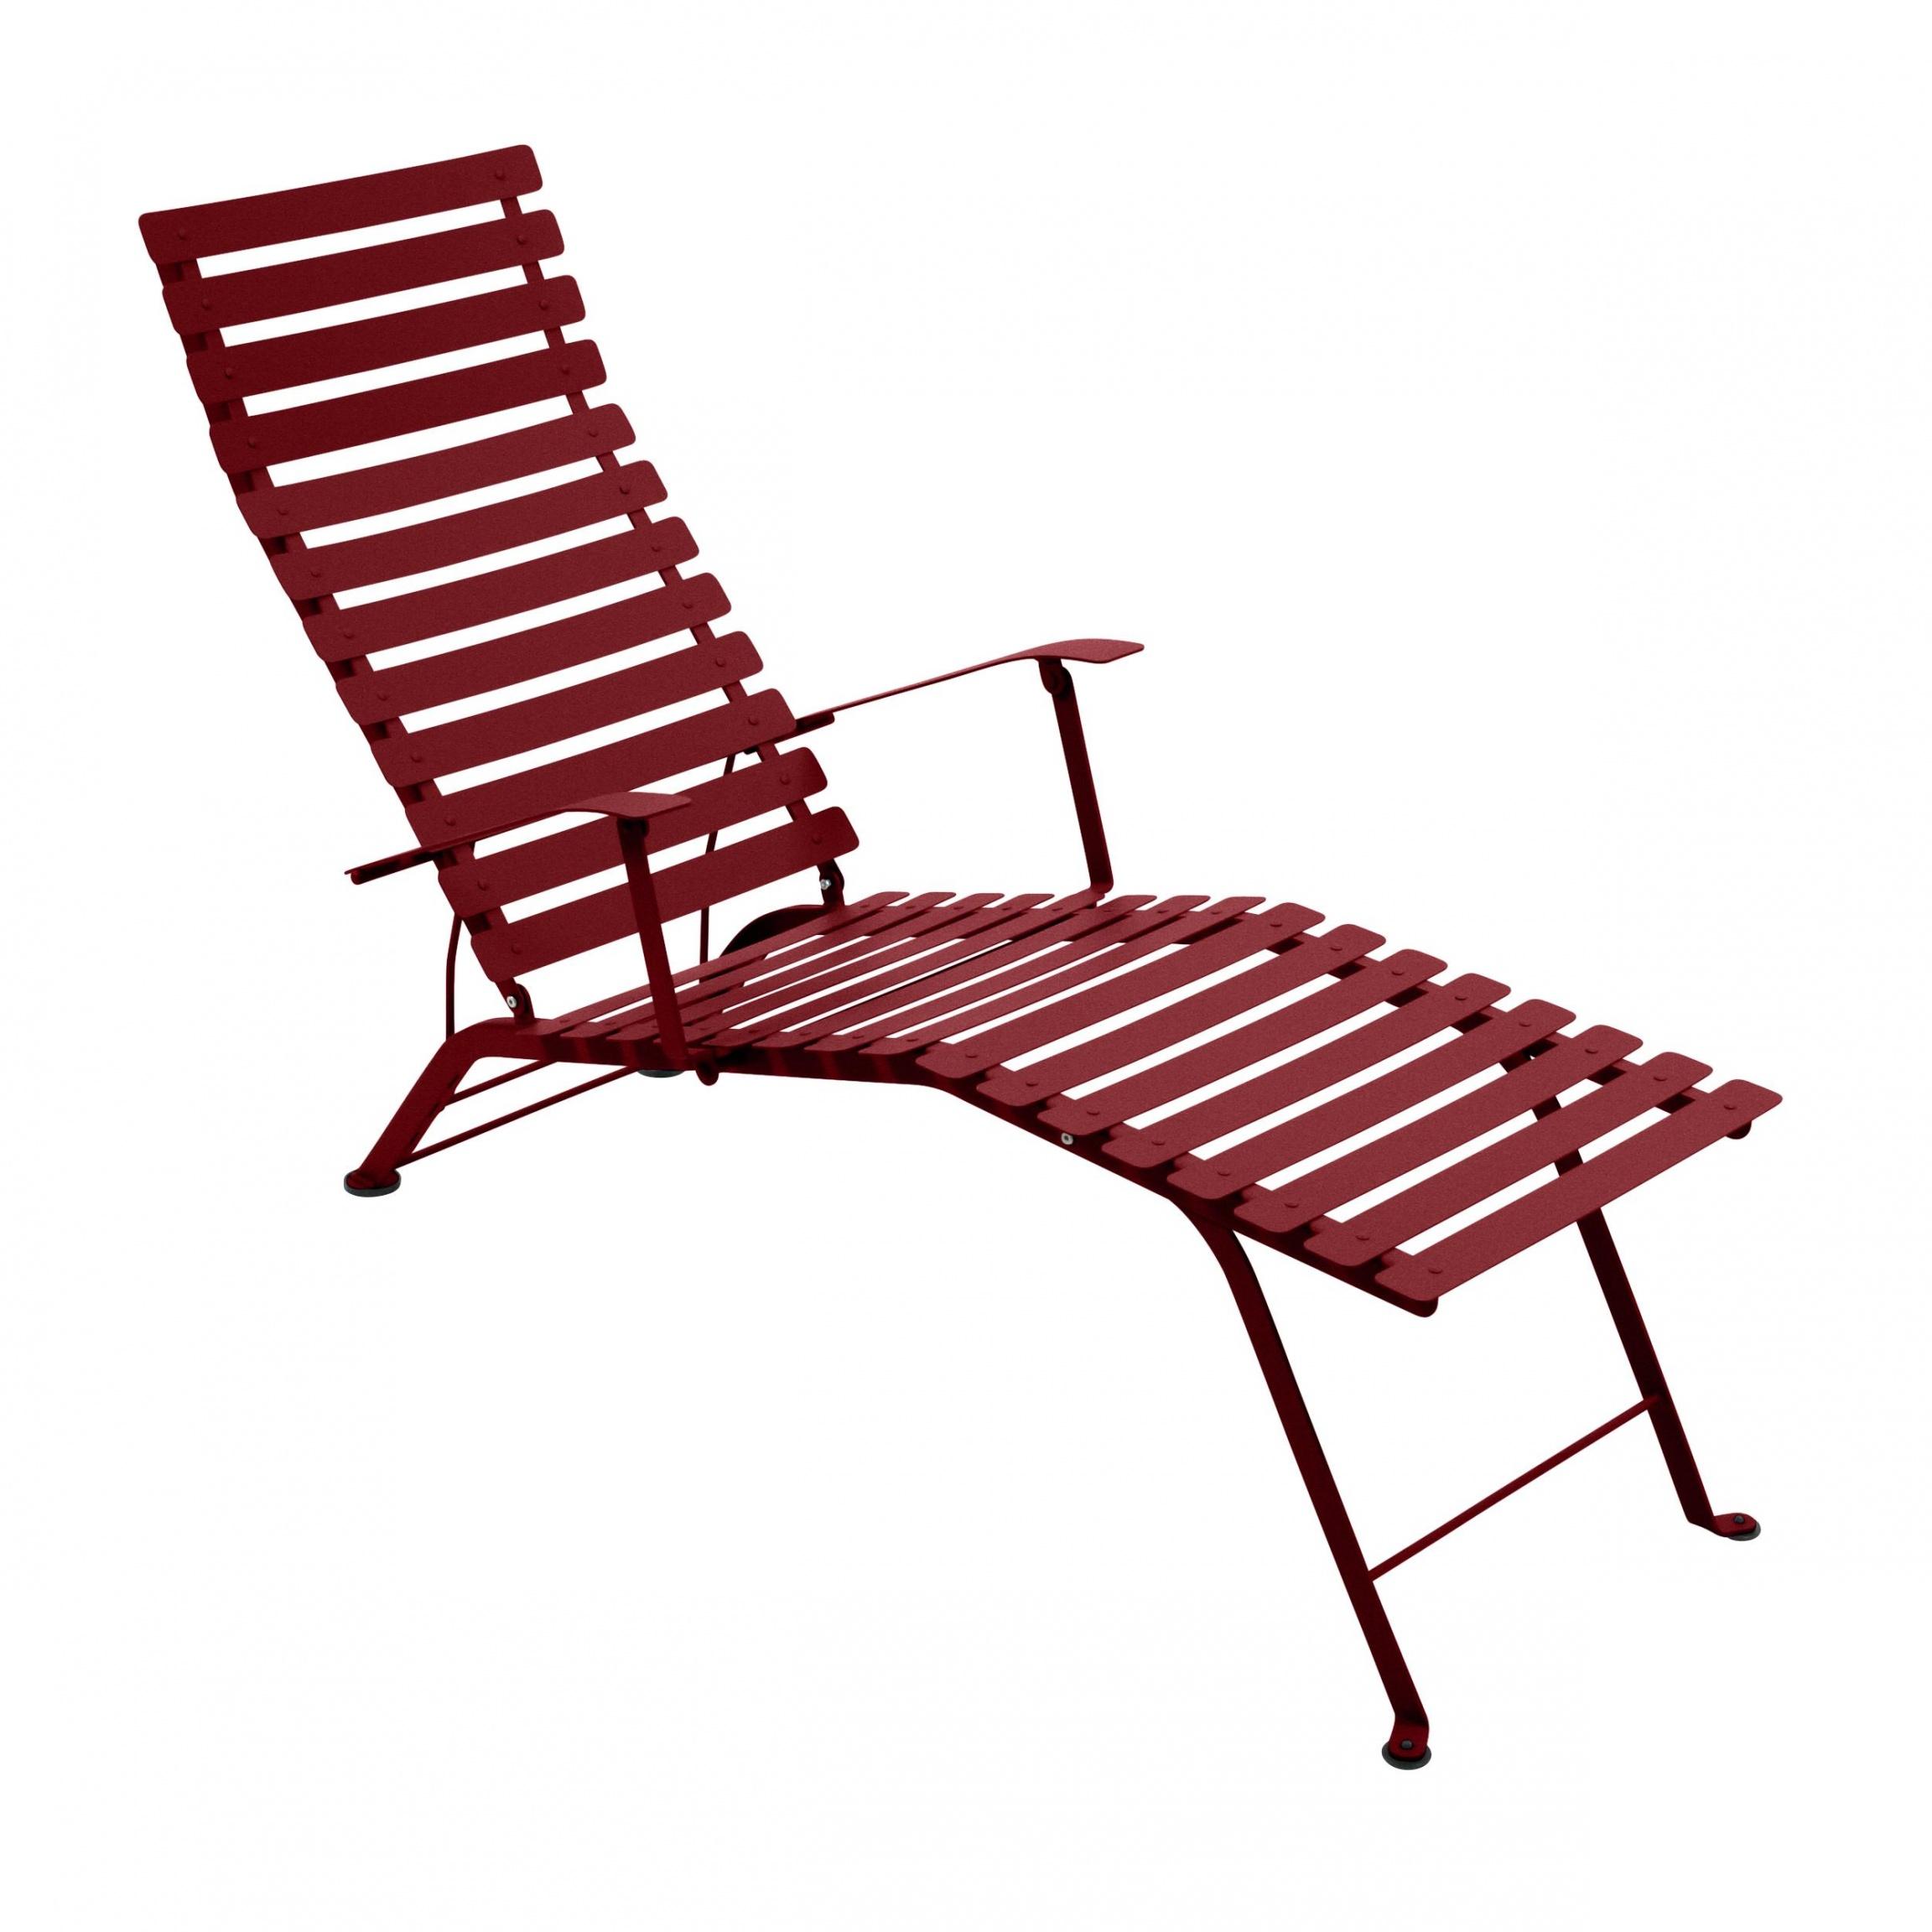 Fermob bistro mtal chaise longue pliante catgorie bain for Chaise longue toile pliante